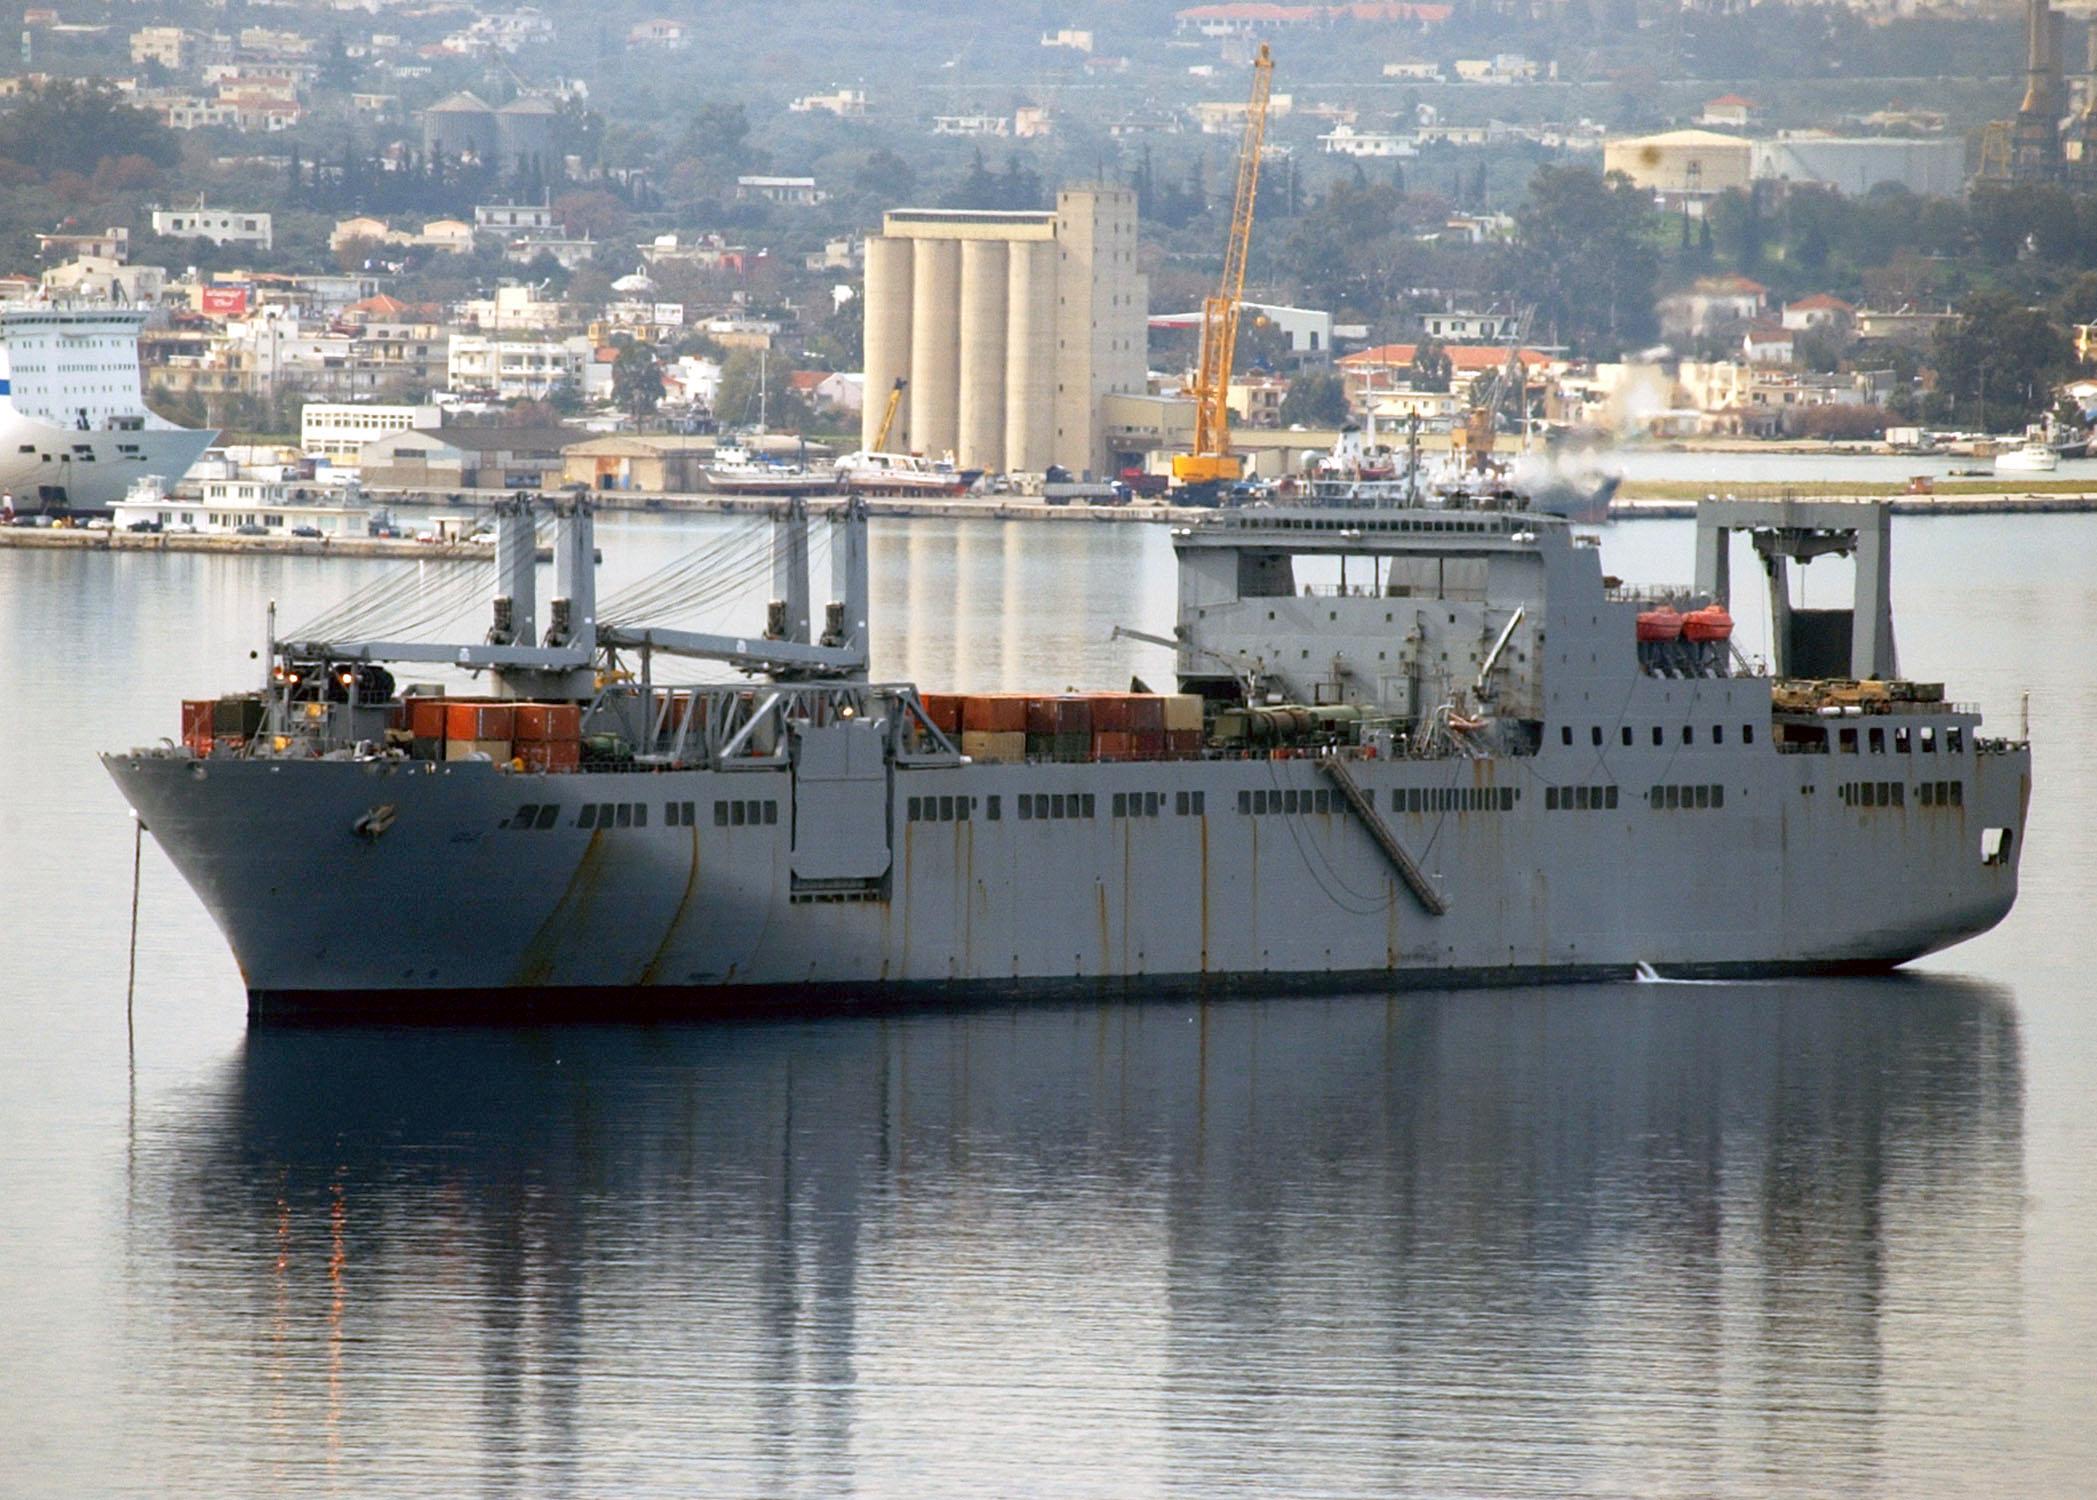 File:USNS Bob Hope (T-AKR 300) at anchorage in Souda harbor.jpg ...